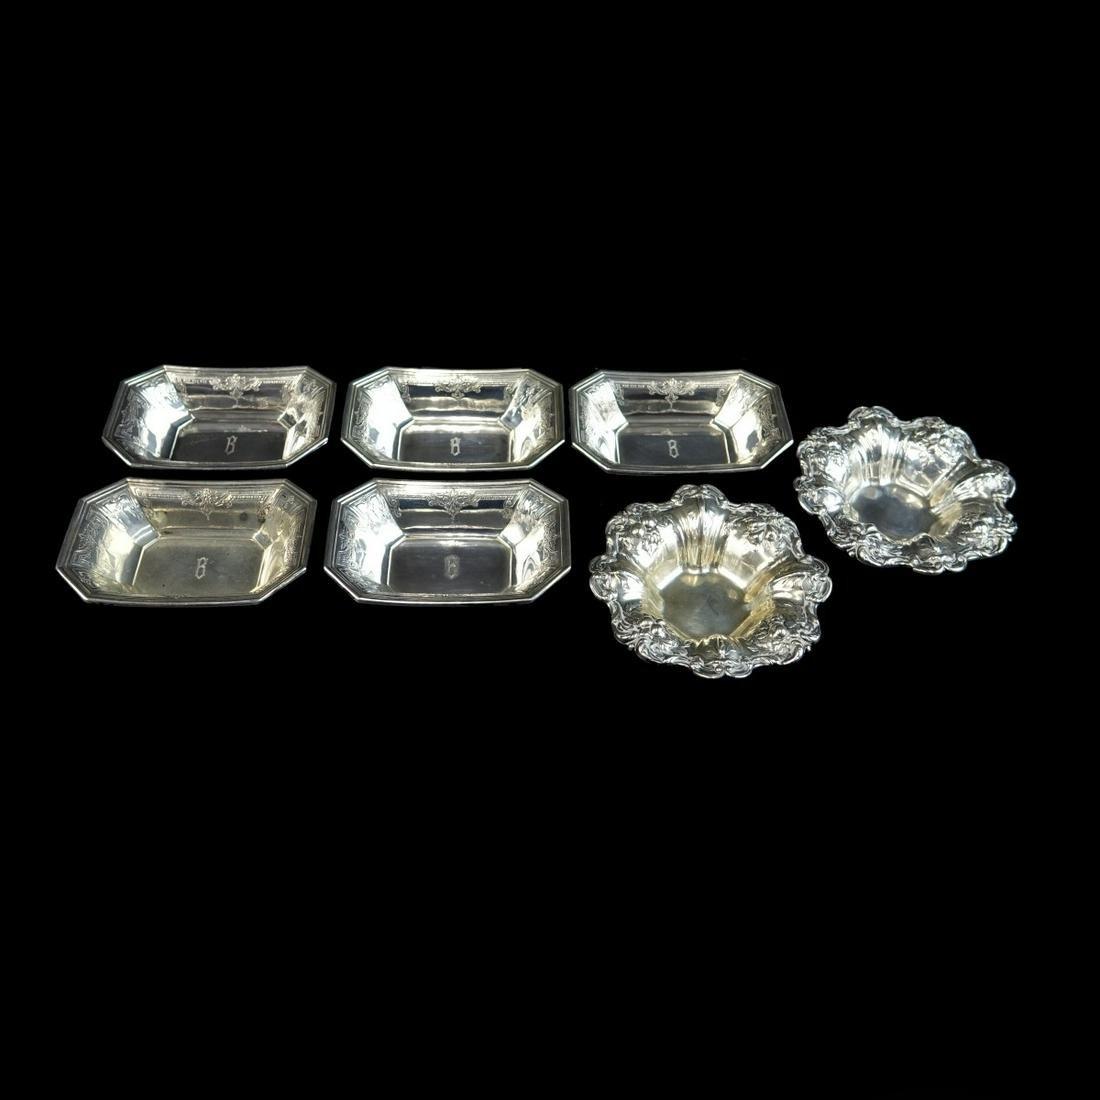 Seven (7) Vintage Sterling Silver Dishes